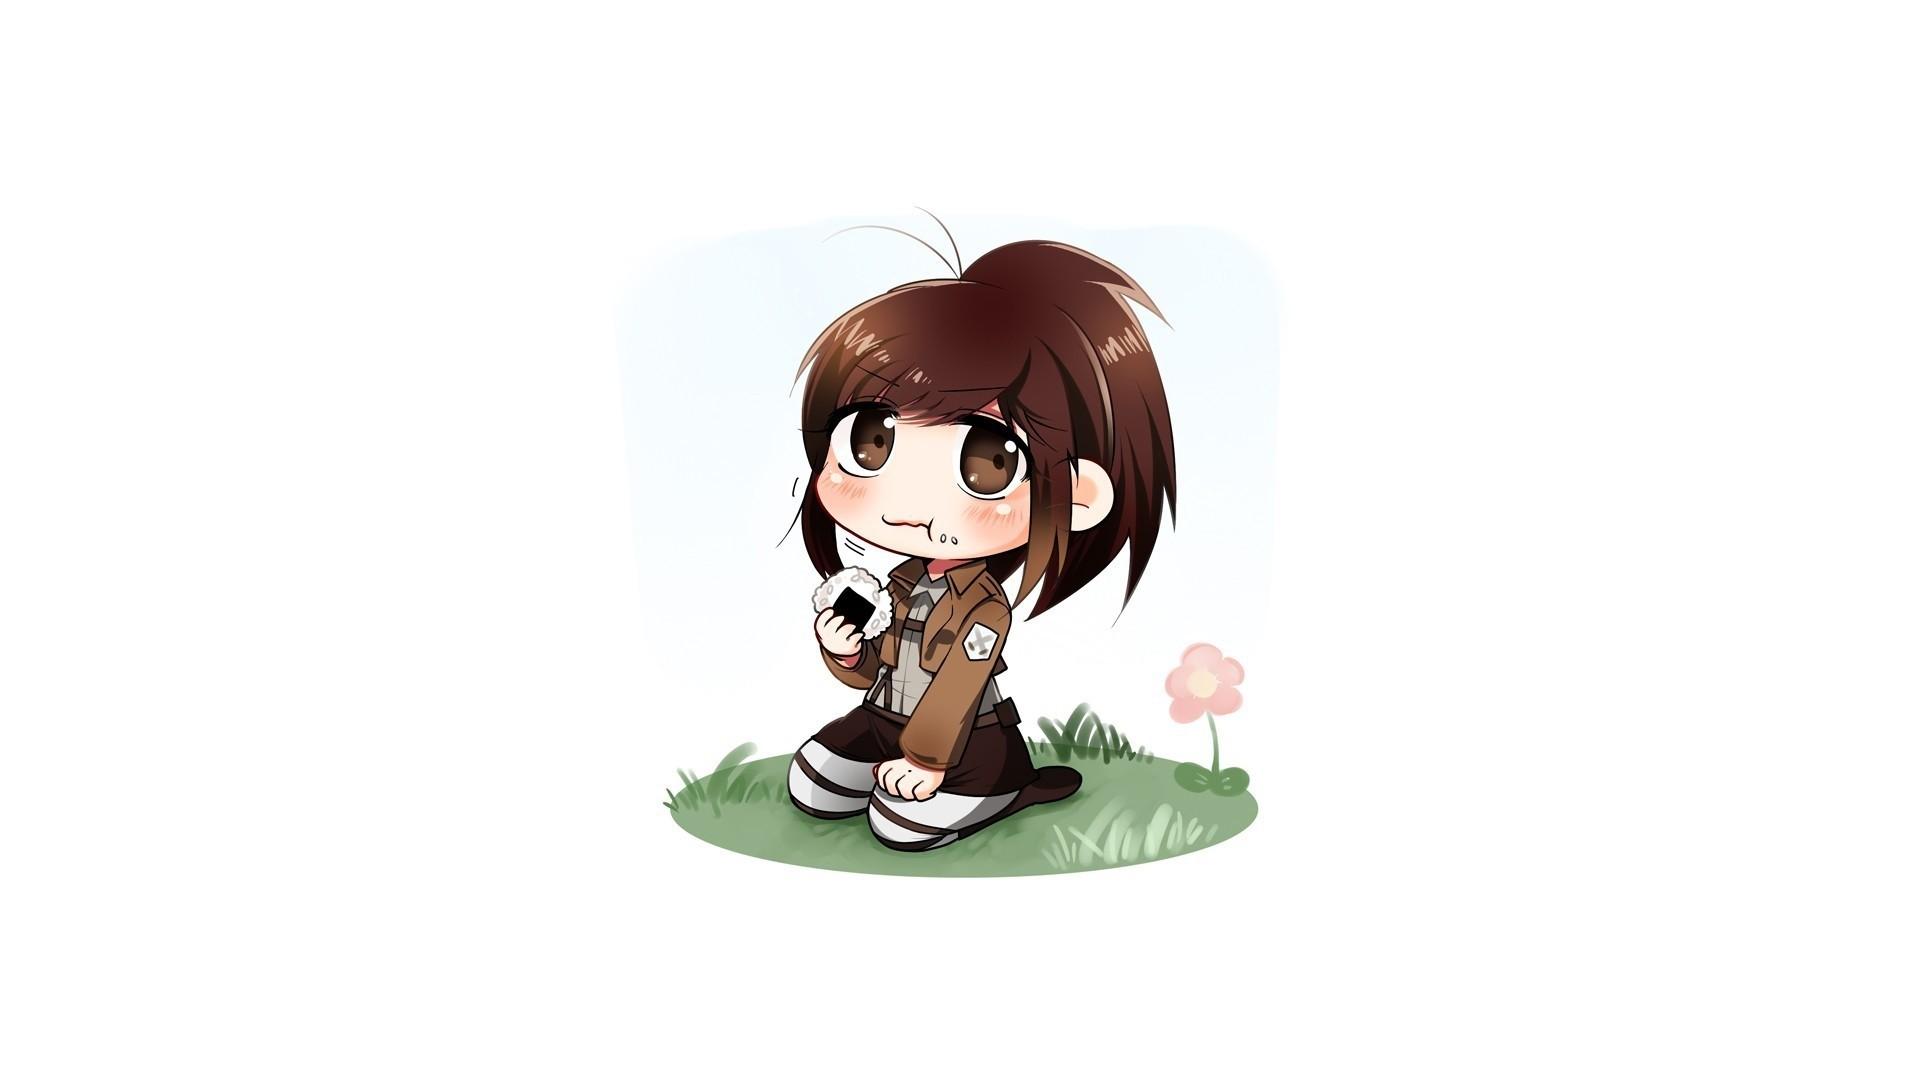 Chibi Anime Girl PC Wallpaper HD